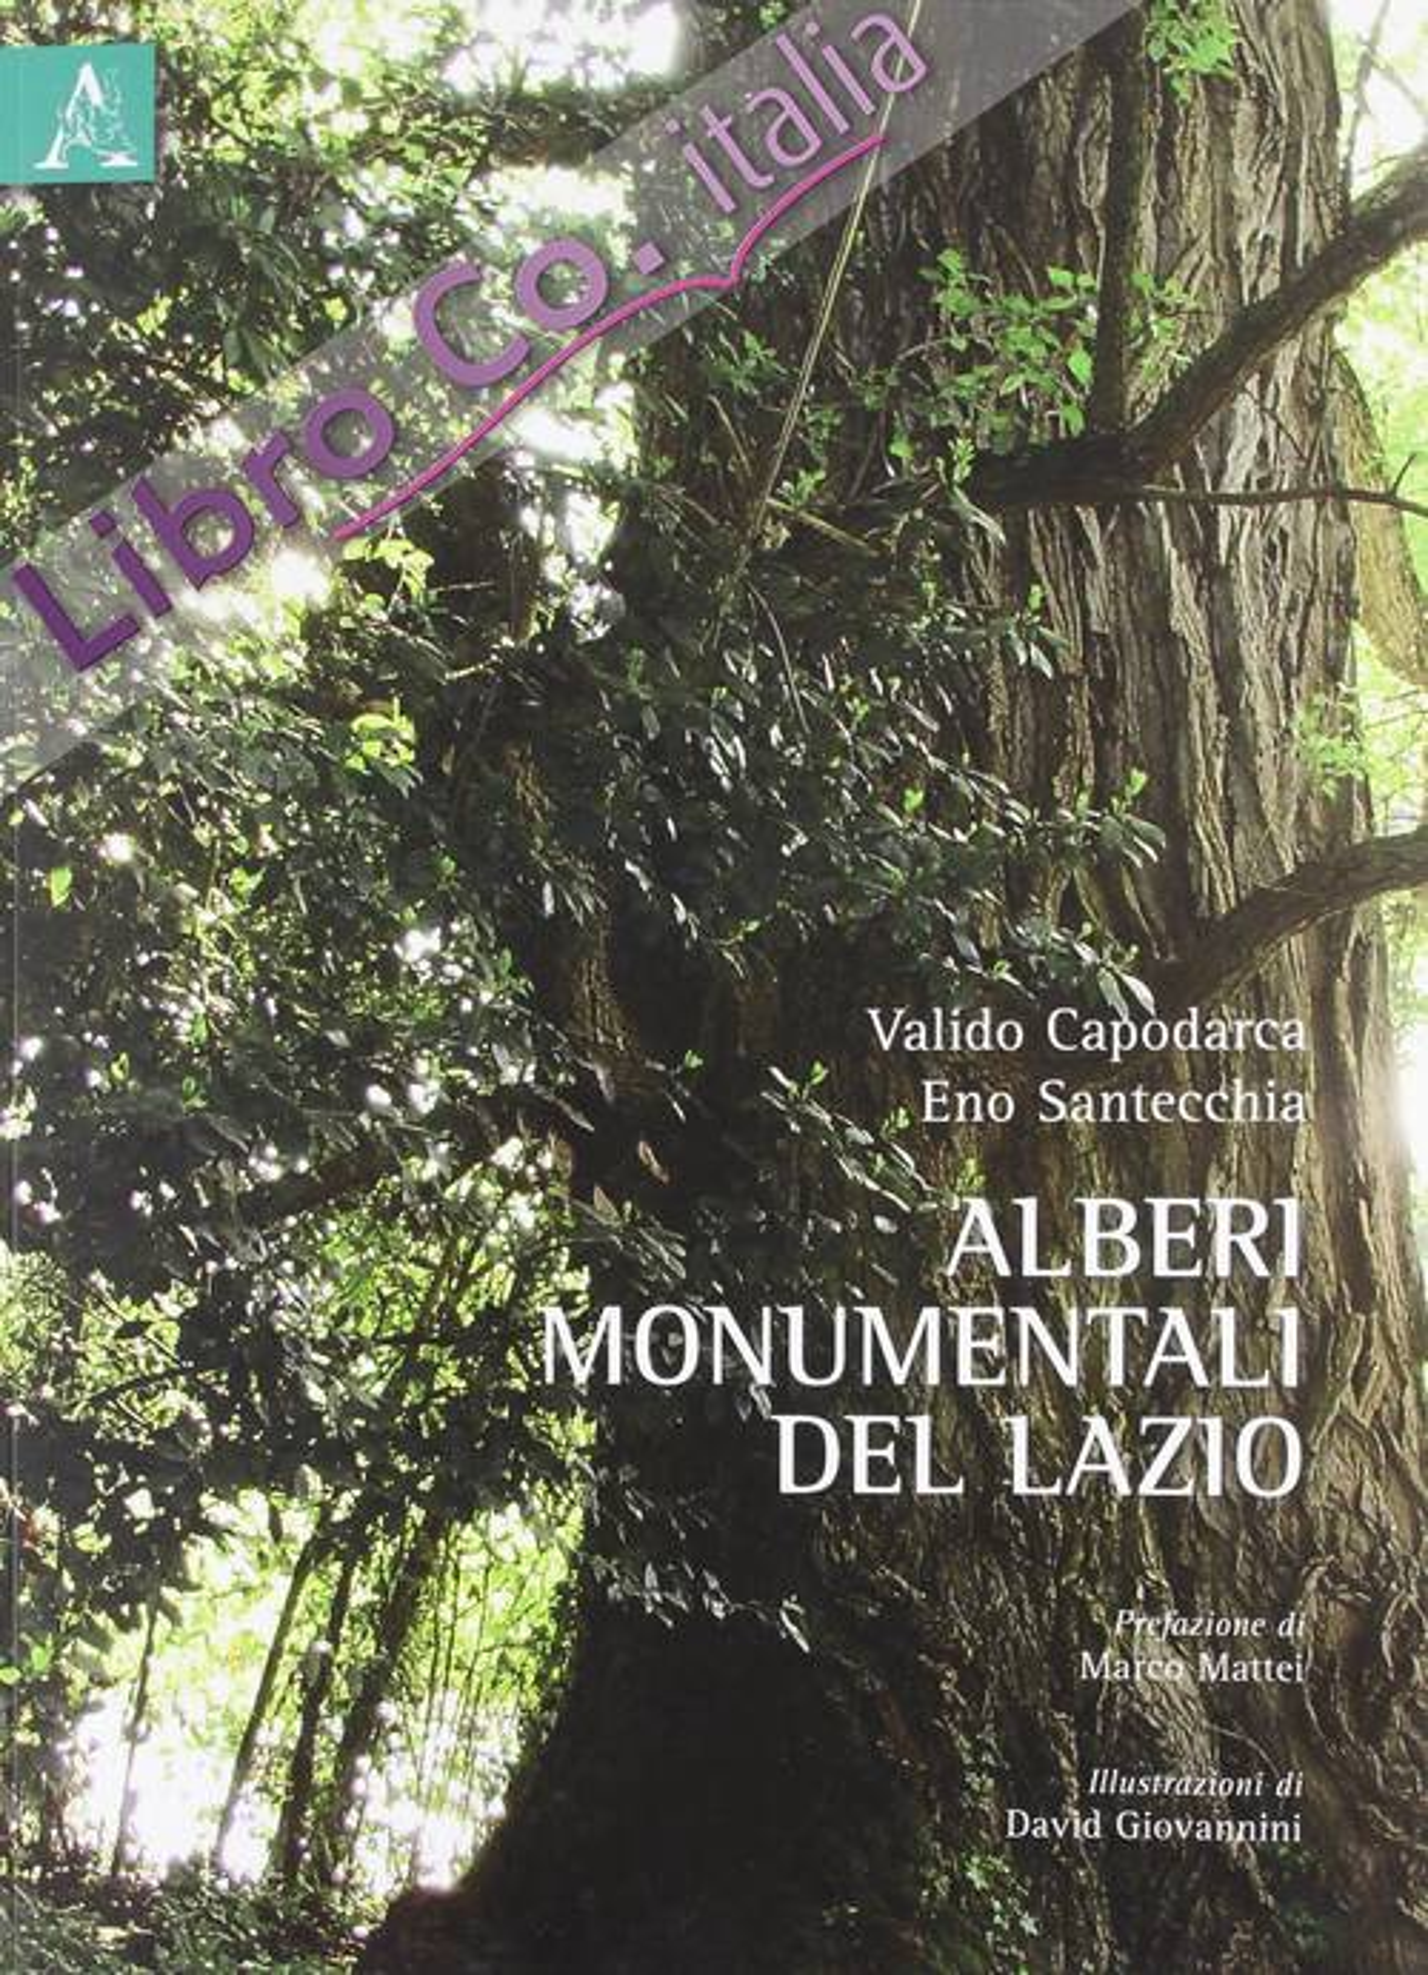 Alberi monumentali del Lazio. Ediz. illustrata